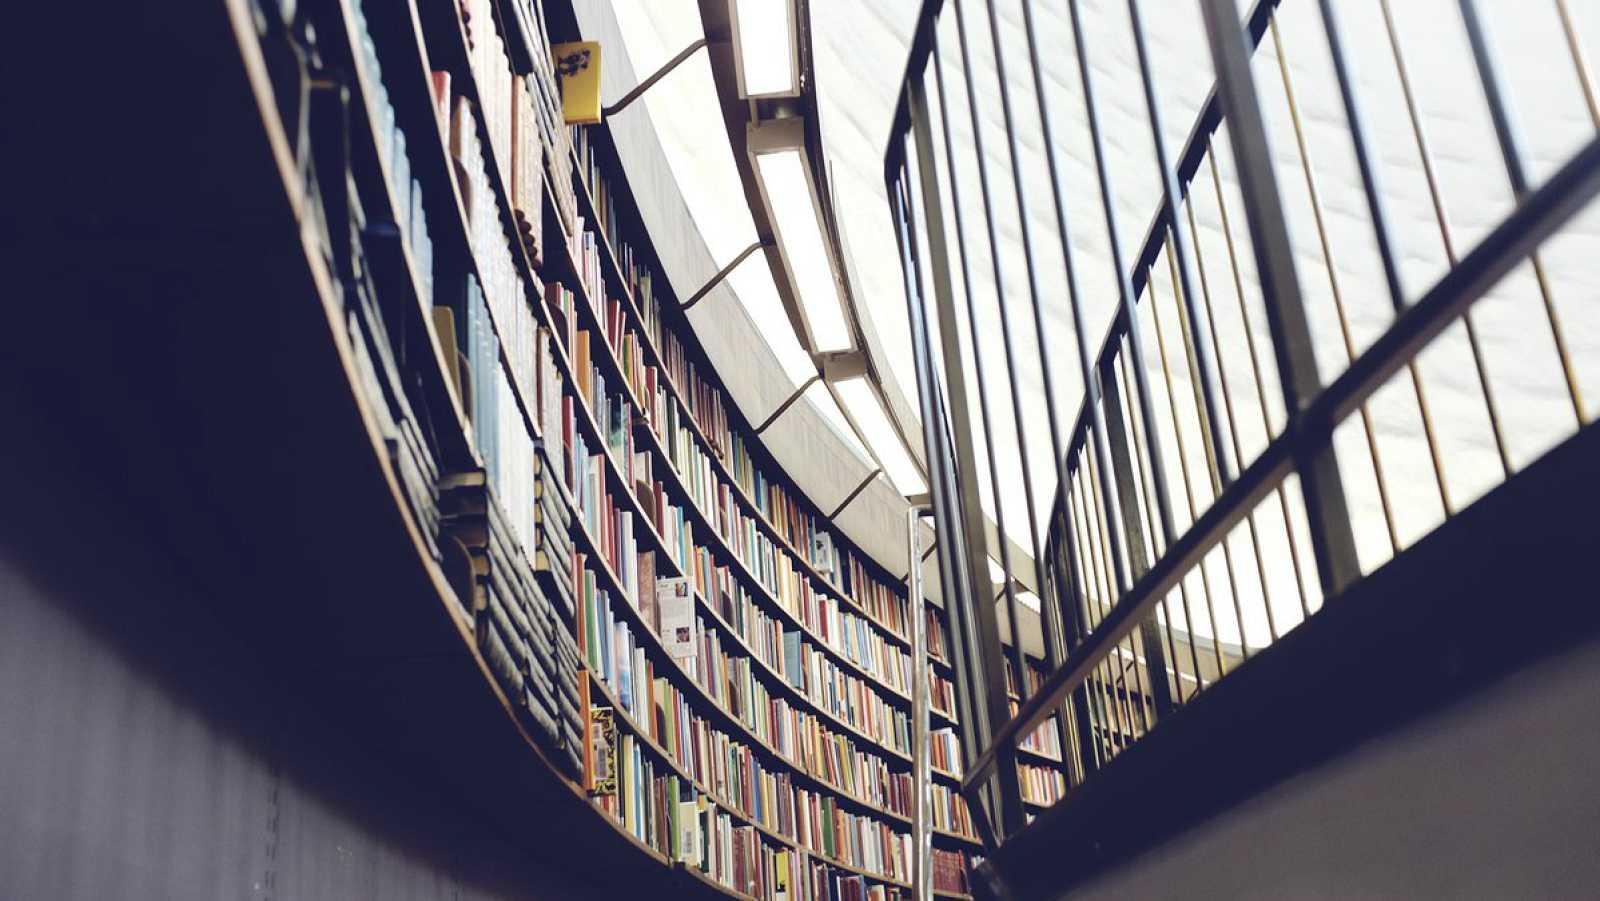 Temas de música - Música medieval en las bibliotecas de hoy: Paris-Bibliothèque National de France (2) - 07/05/17 - escuchar ahora